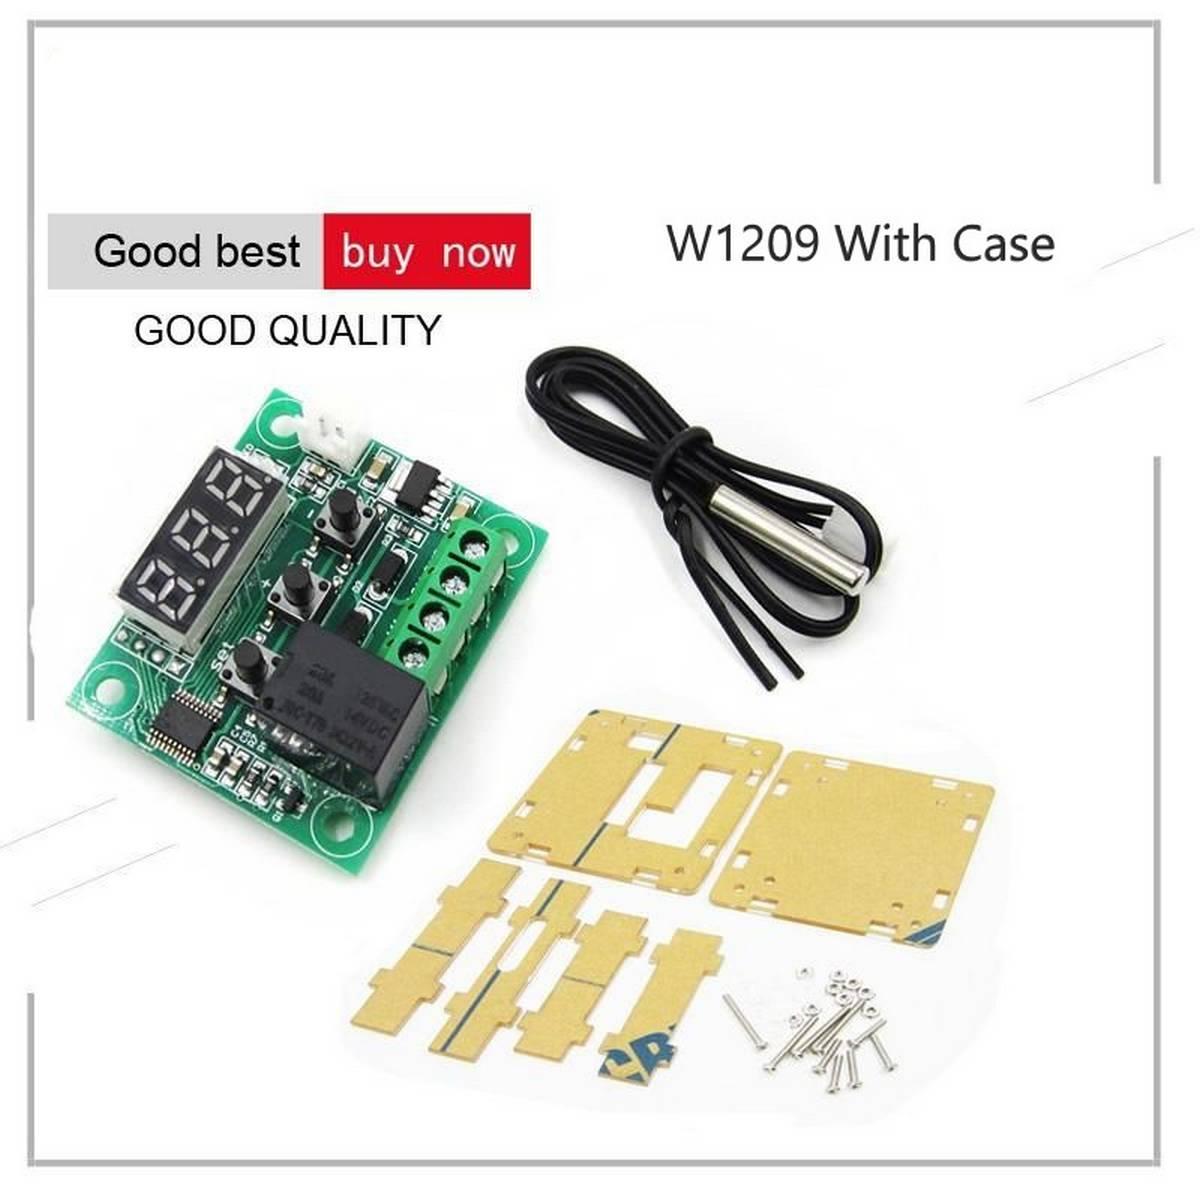 W1209 12V Digital Thermostat Temperature Thermo Controller Switch Module & Case